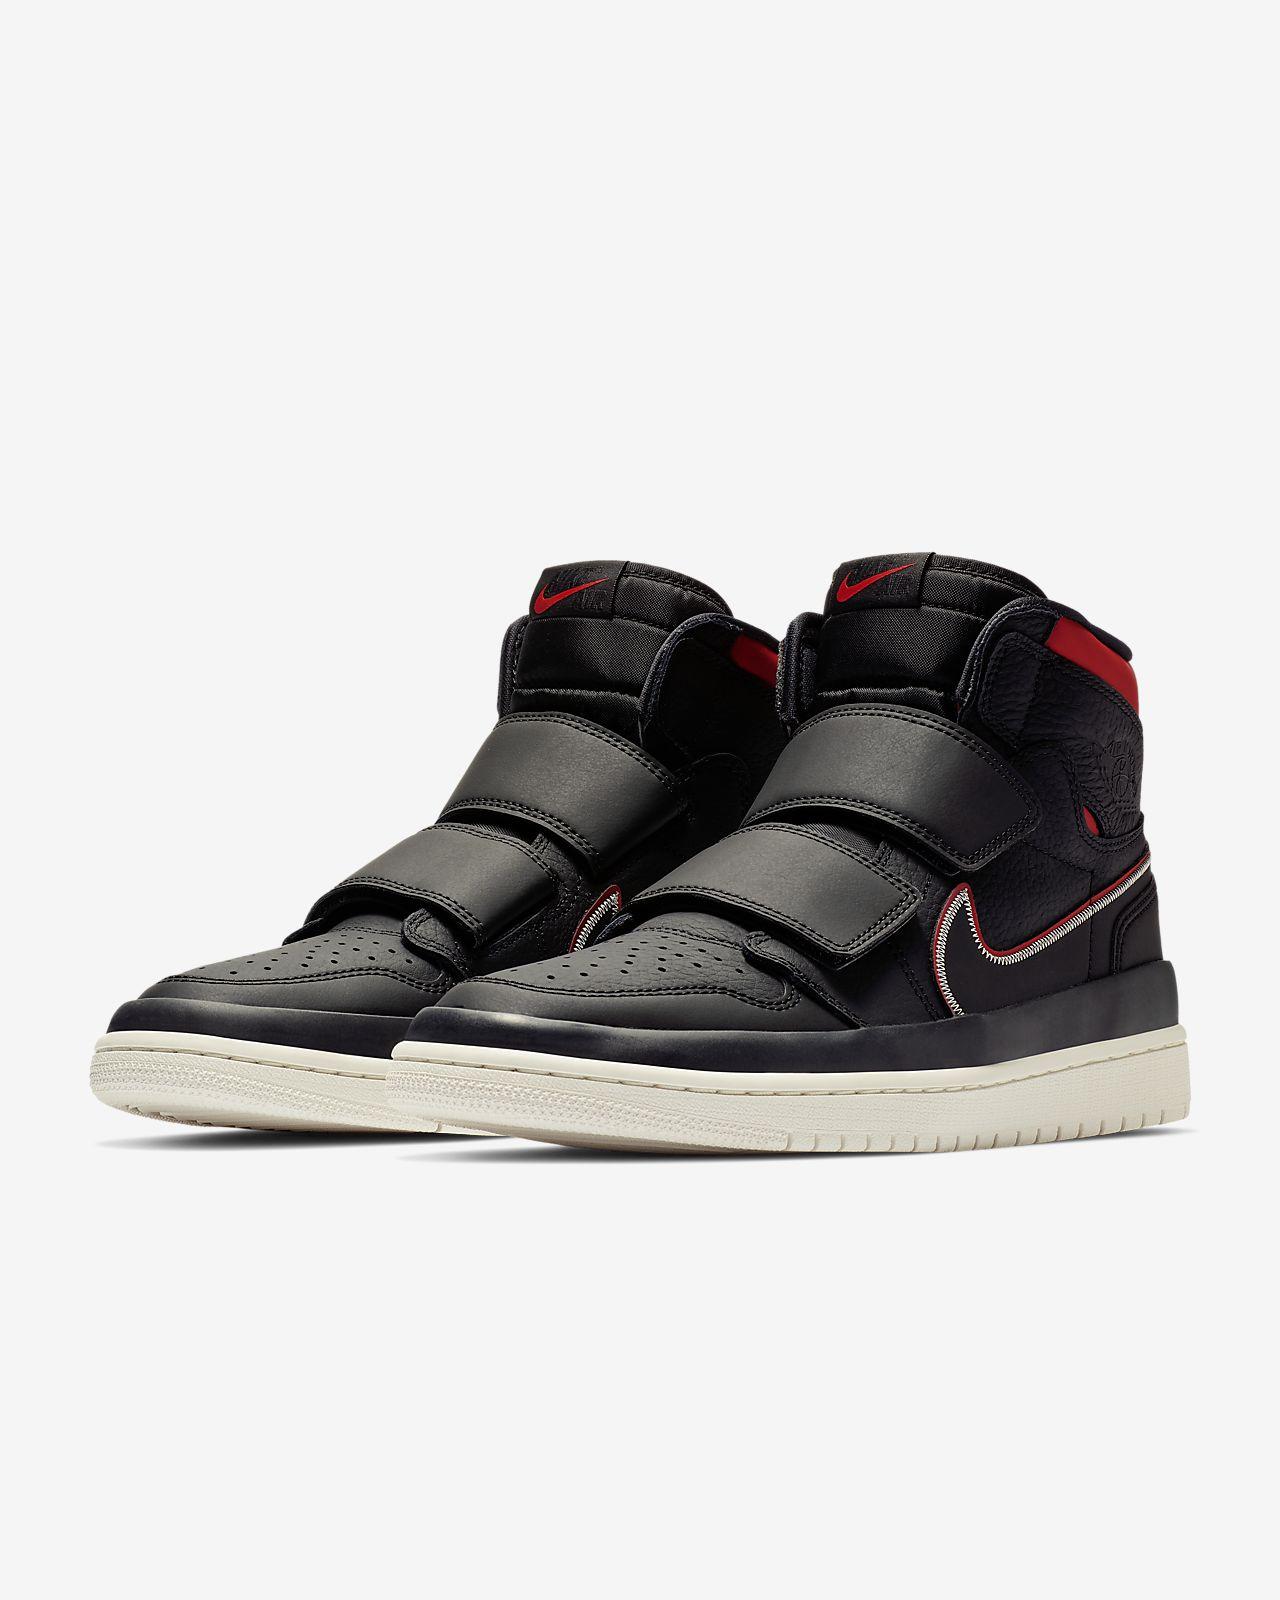 389a4736bb433d Air Jordan 1 Retro High Double-Strap Men s Shoe. Nike.com GB